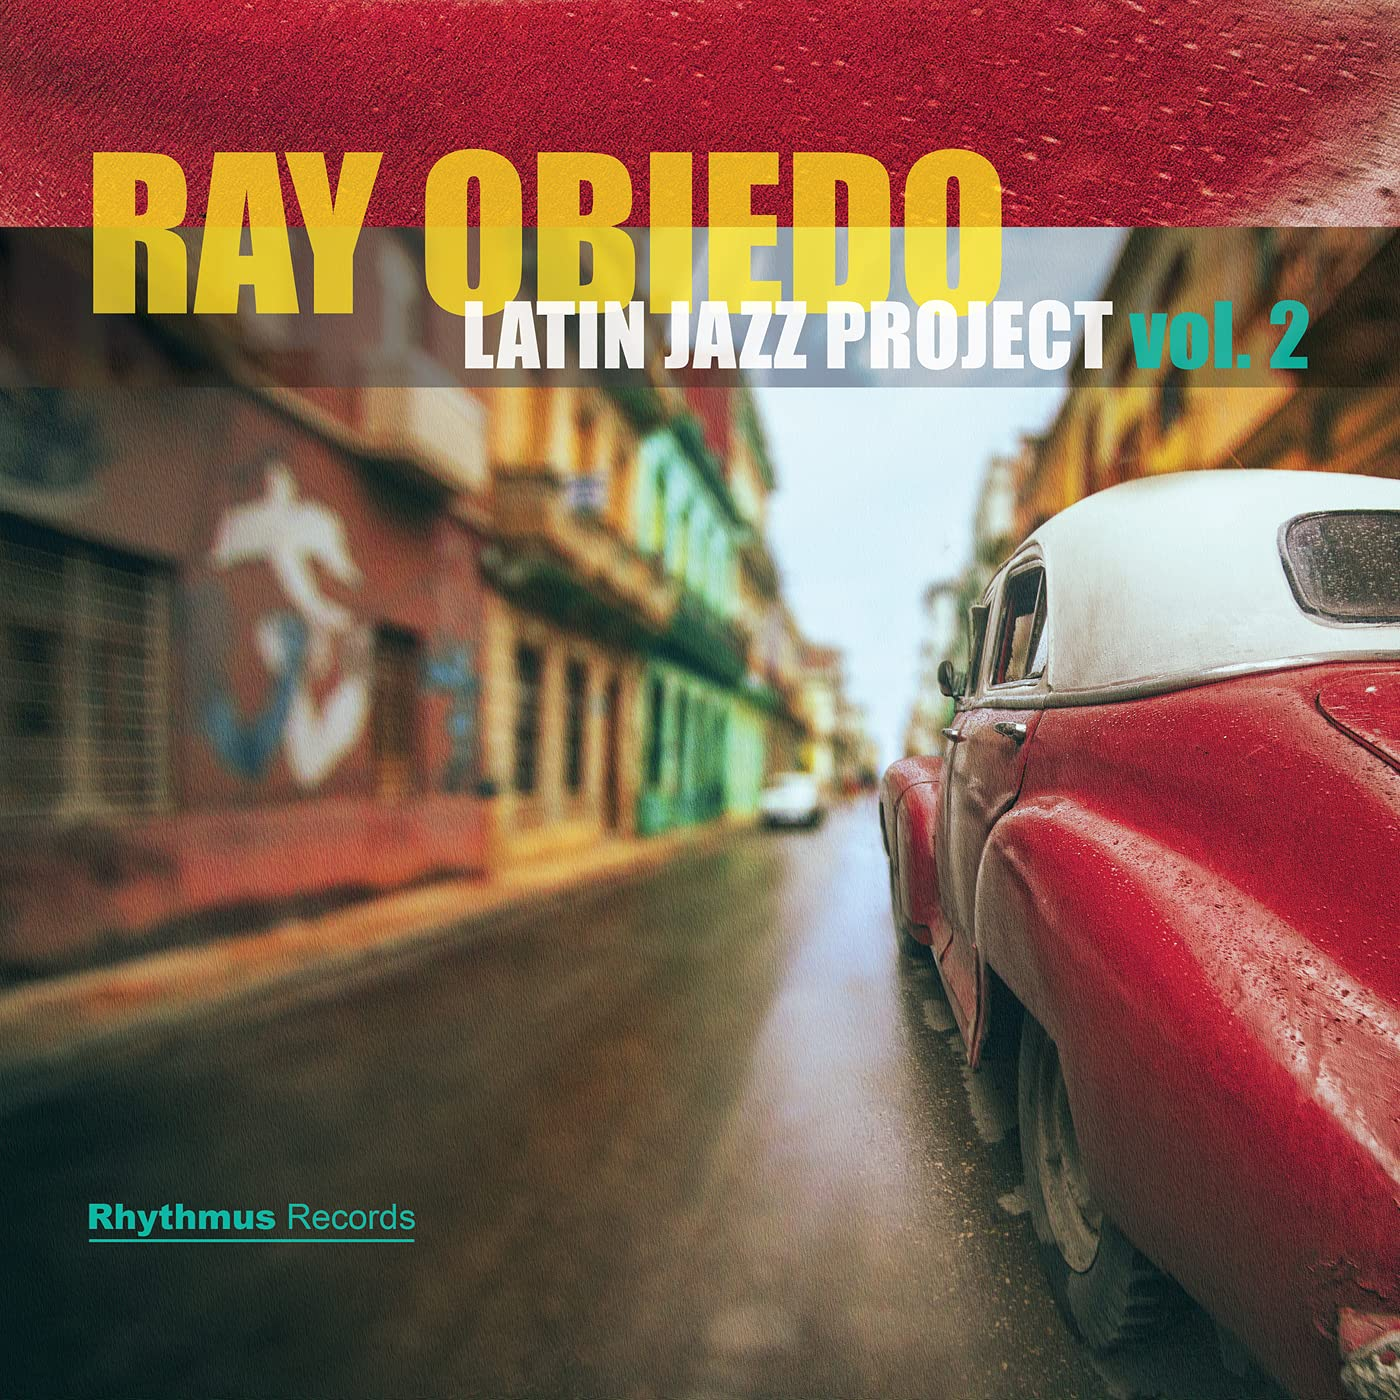 RAY OBIEDO - Latin Jazz Project, Vol. 2 cover